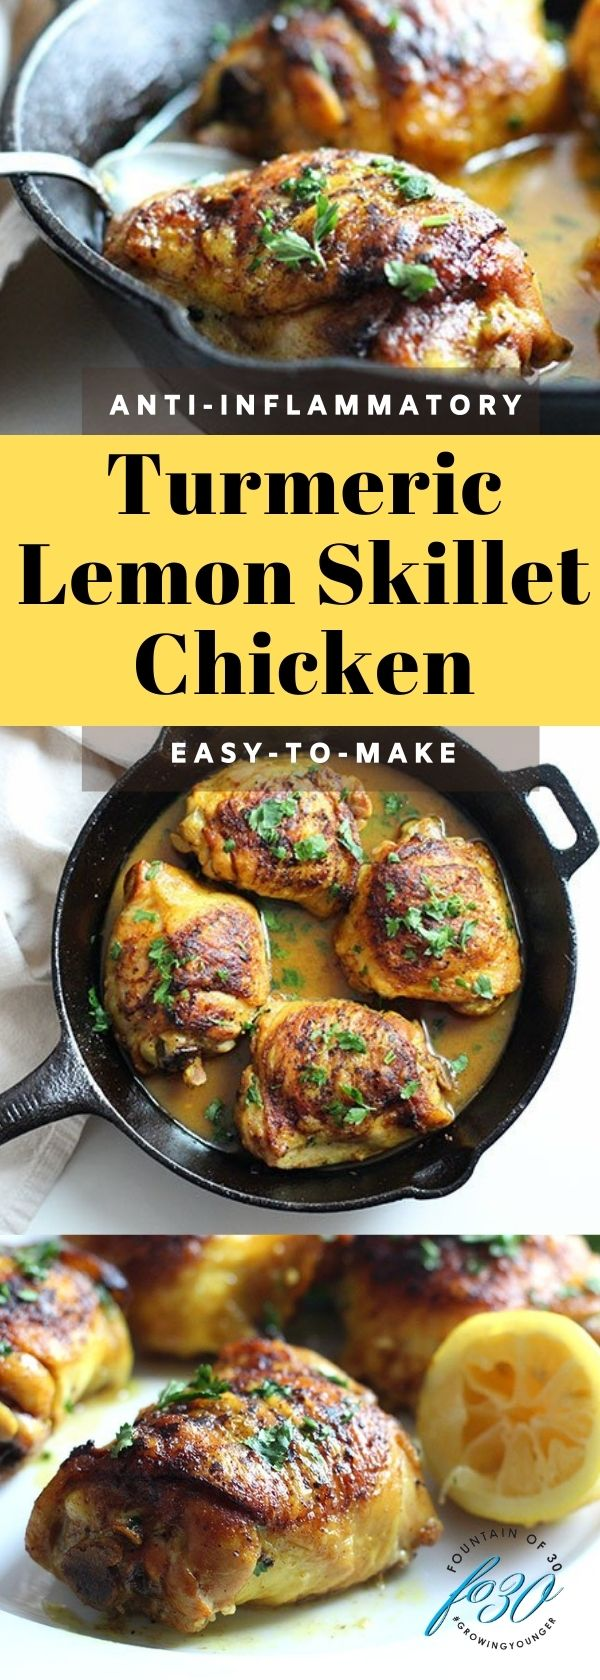 turmeric lemon chicken fountainof30